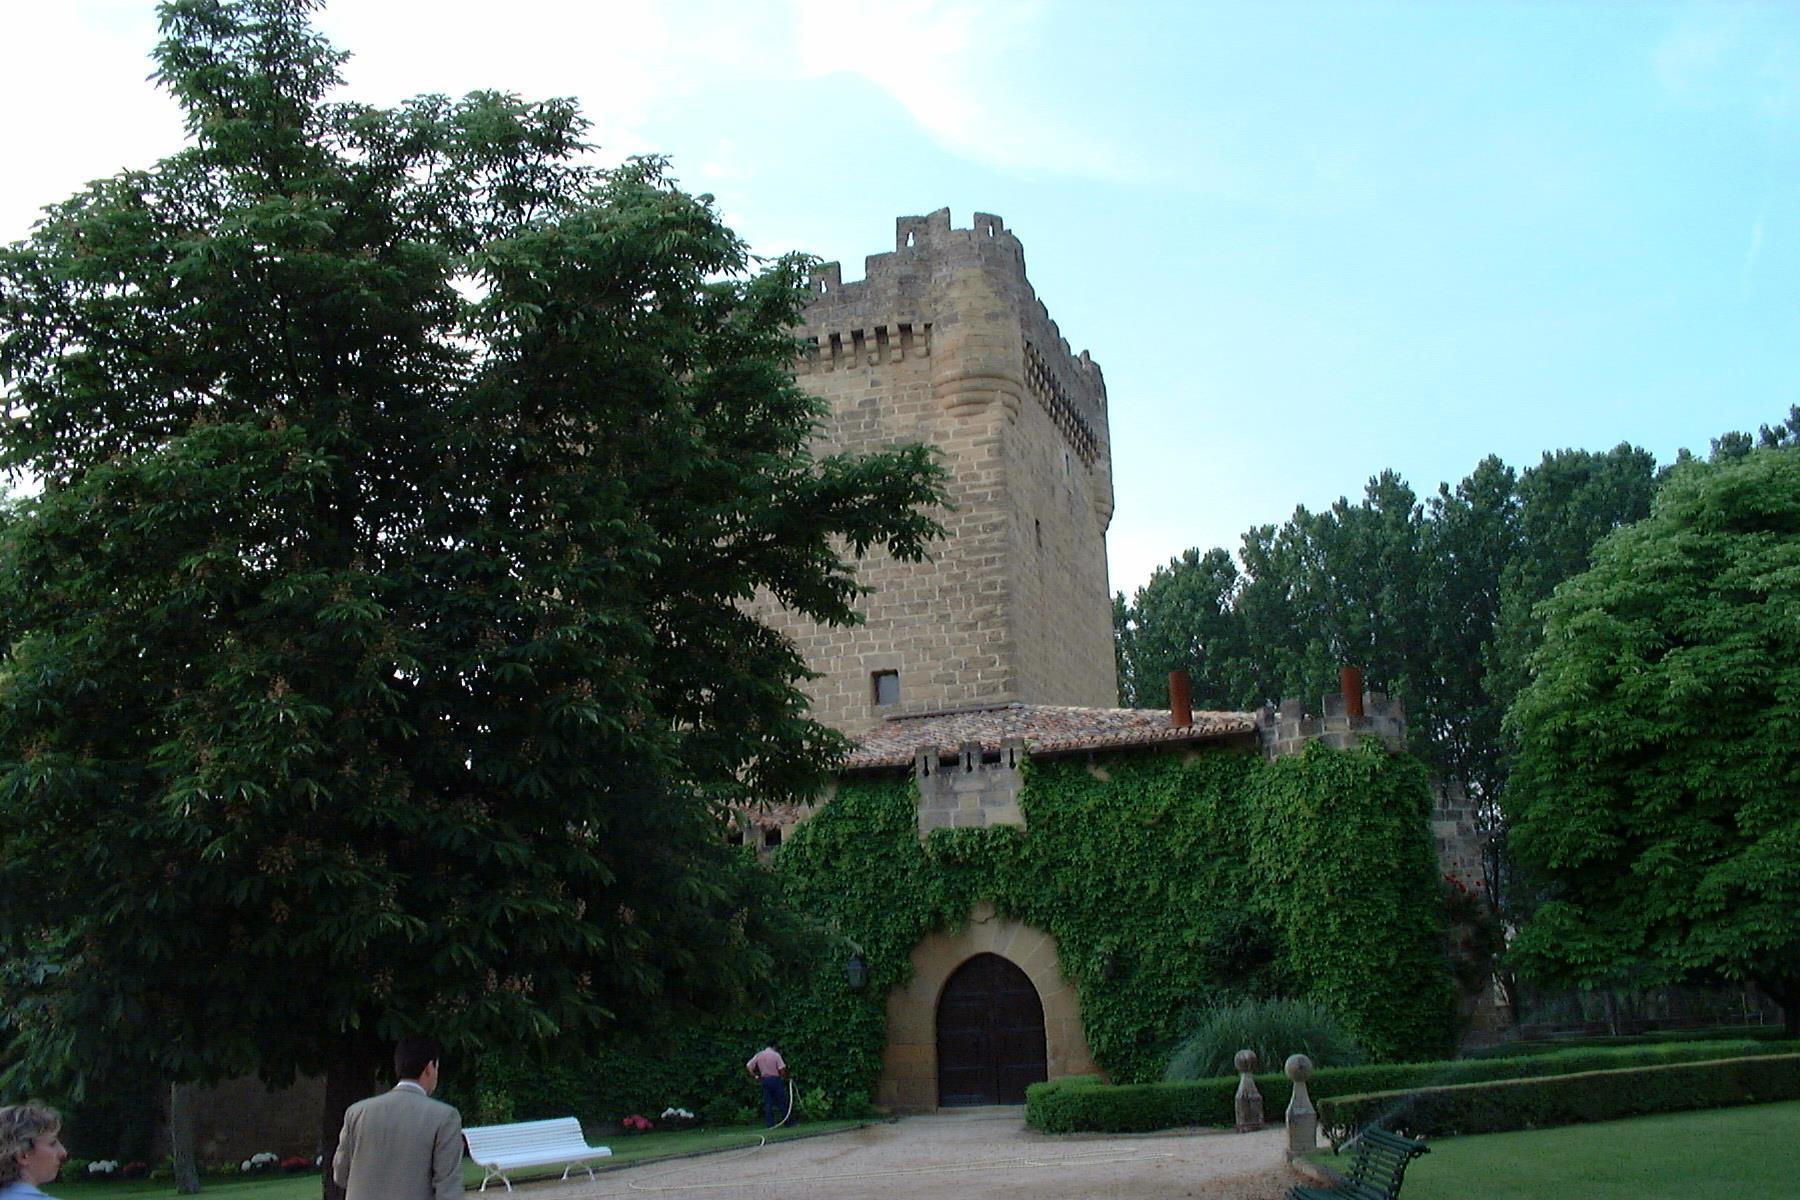 Bodegas castillo de cuzcurrita winery la rioja turismo - Entradas baratas castillo de las guardas ...